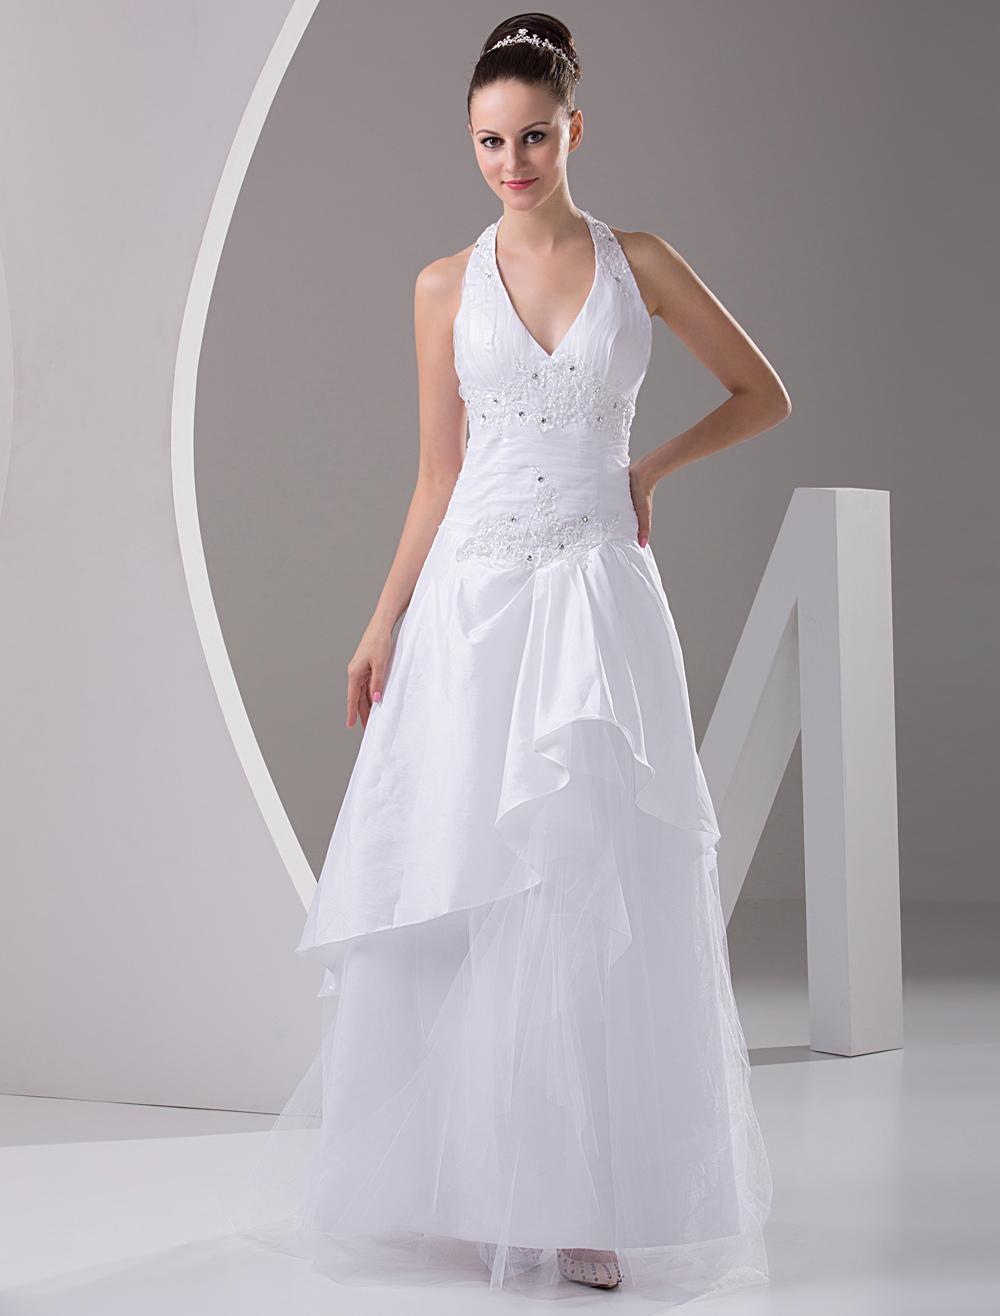 White A-line Halter V-Neck Taffeta Organza Wedding Gown